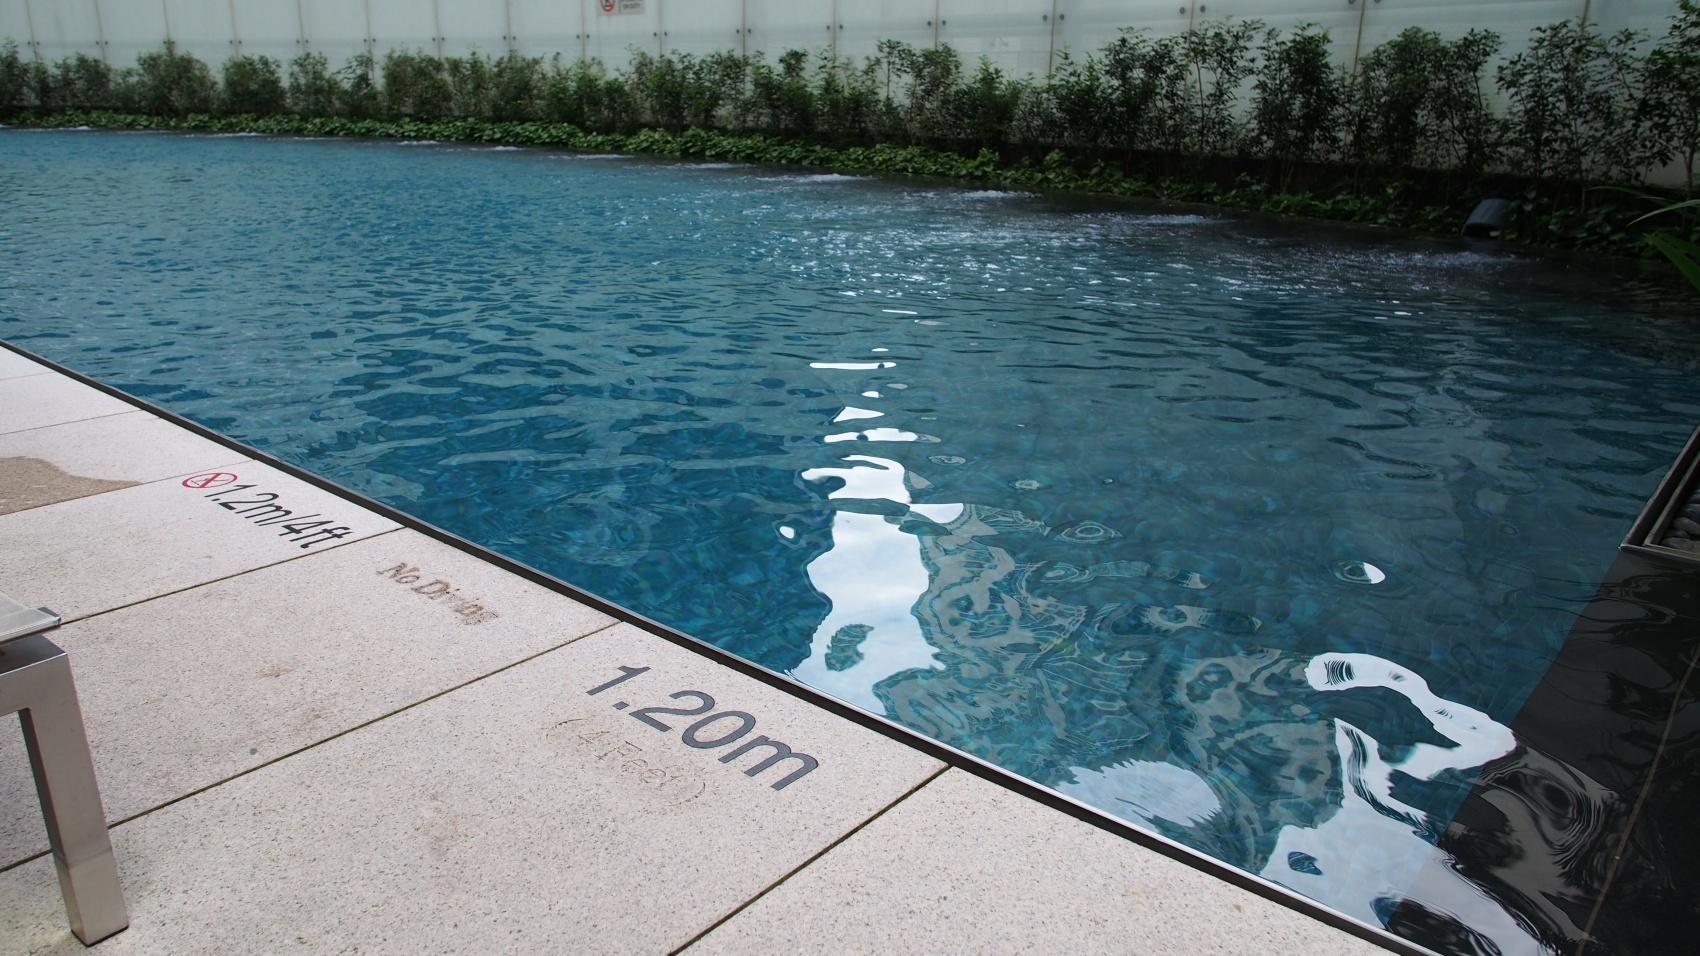 St Regis Hotel Swimming Pool